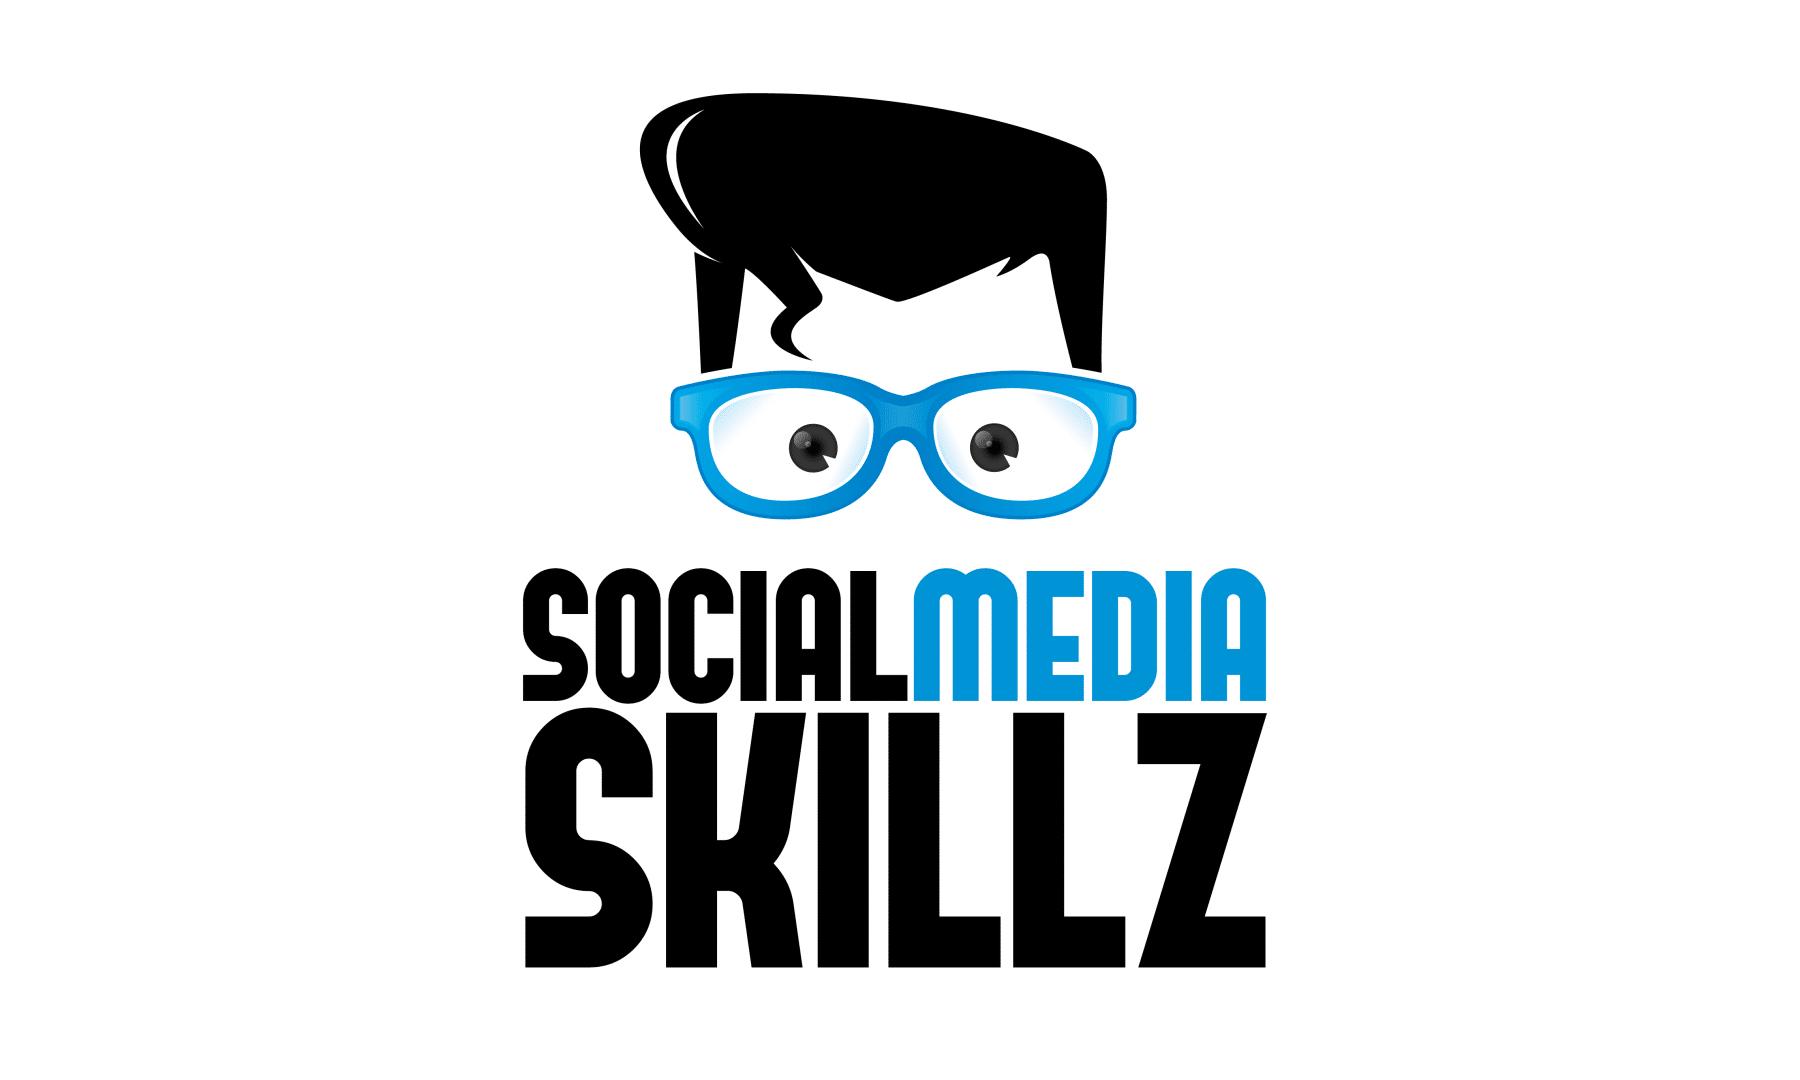 Social Meda Skillz Graphic